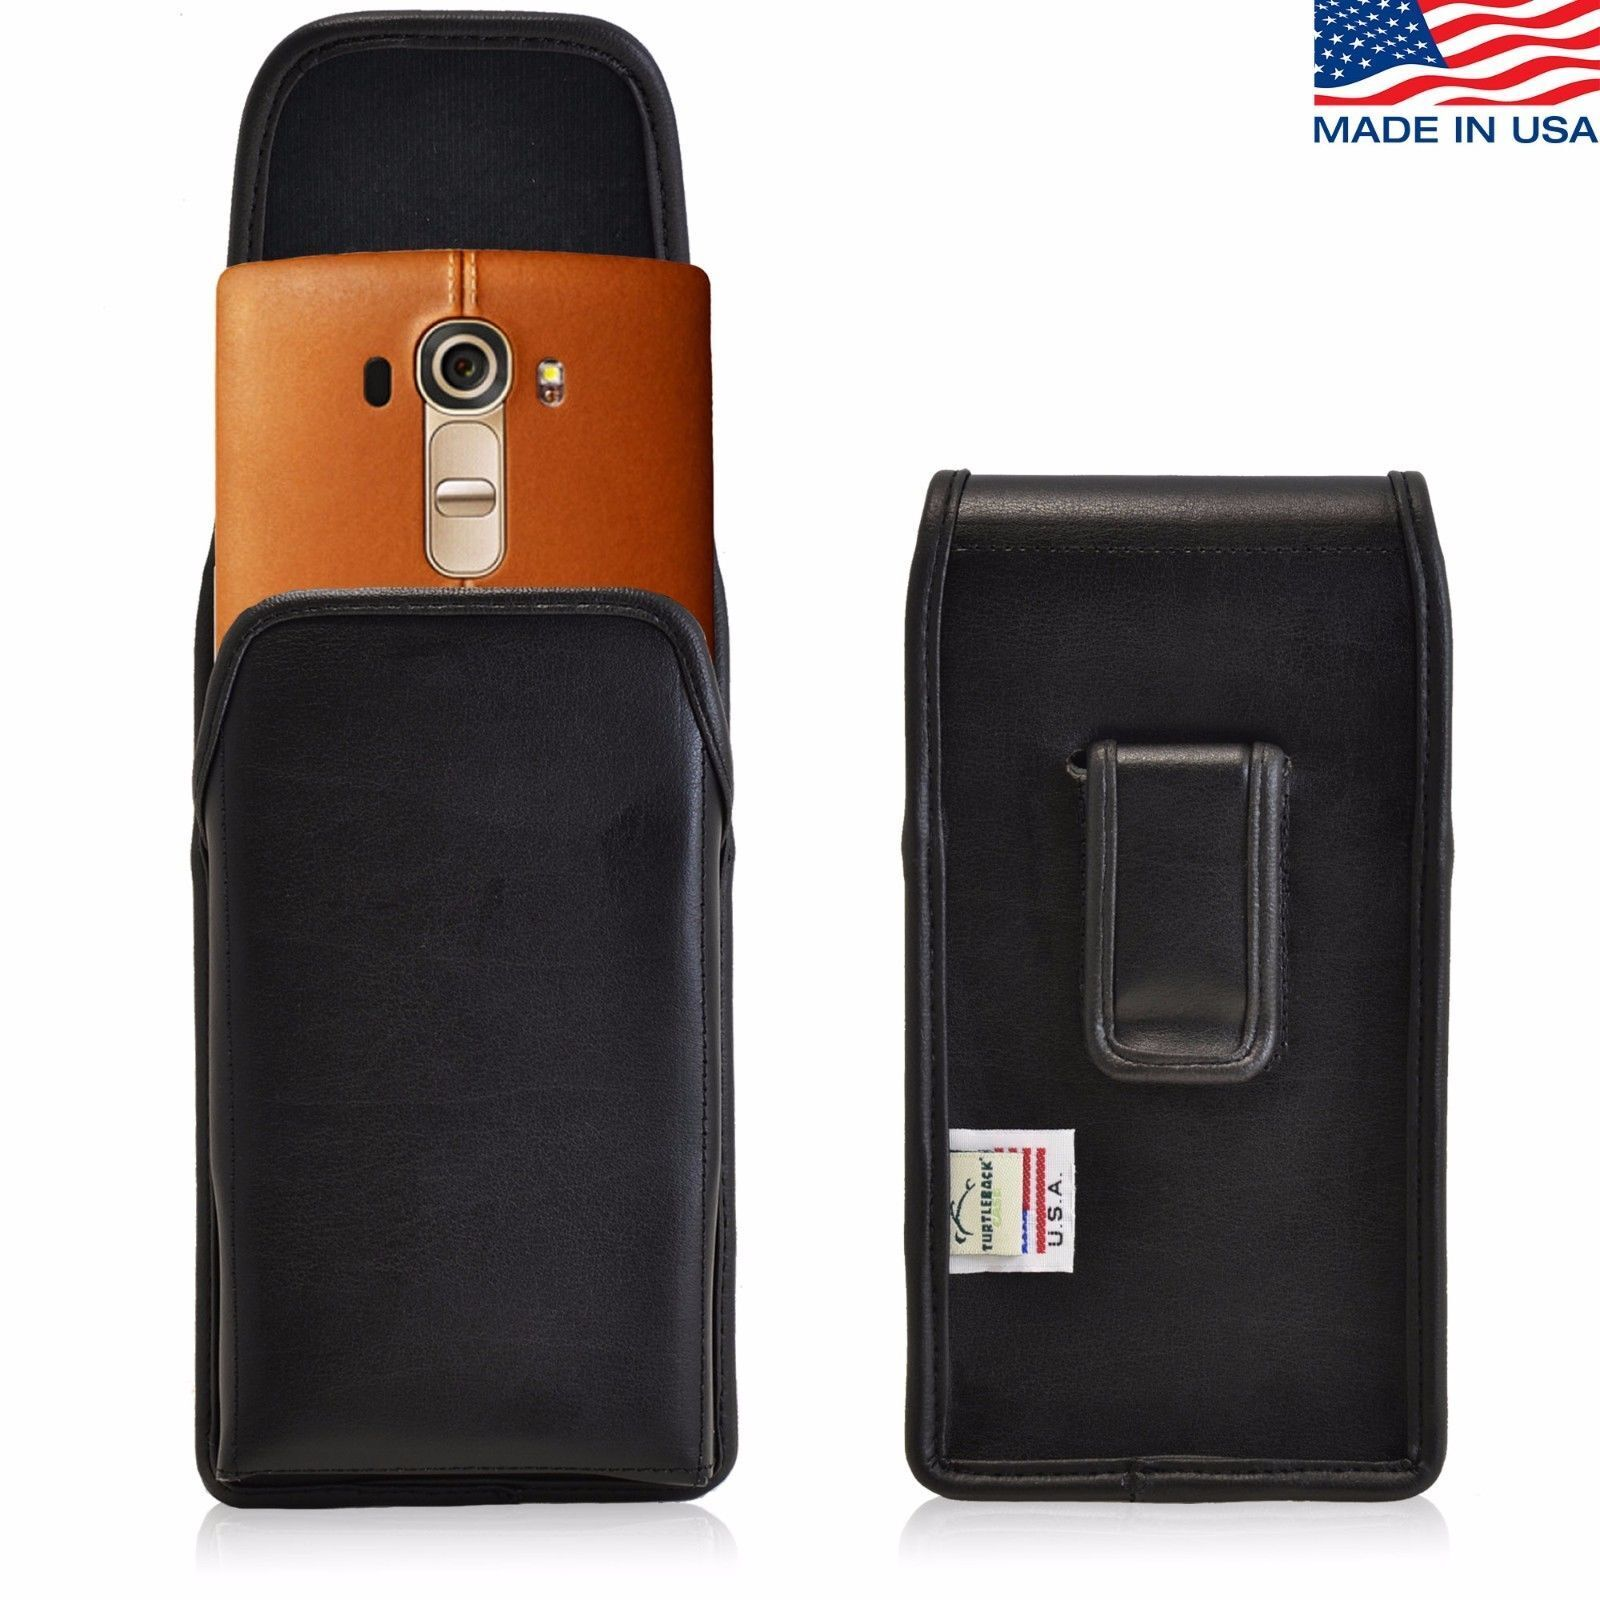 turtleback-vertical-leather-holster-pouch-black-belt-clip-phone-case-for-lg-g4